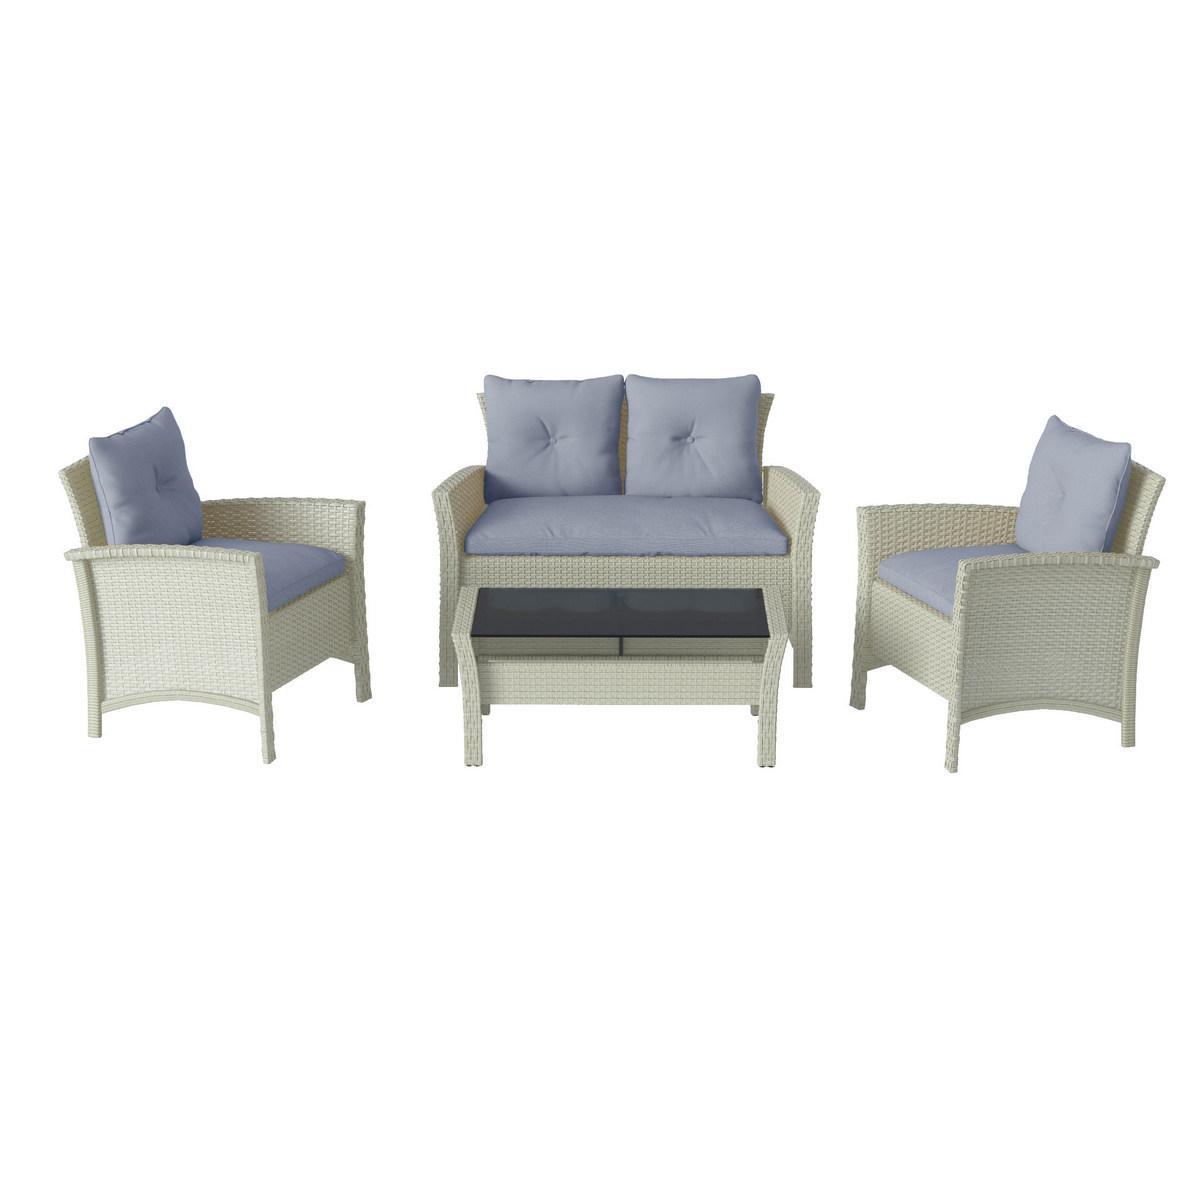 Corliving Distressed Grey Resin Rattan Wicker Patio Set Light Blue Cushions